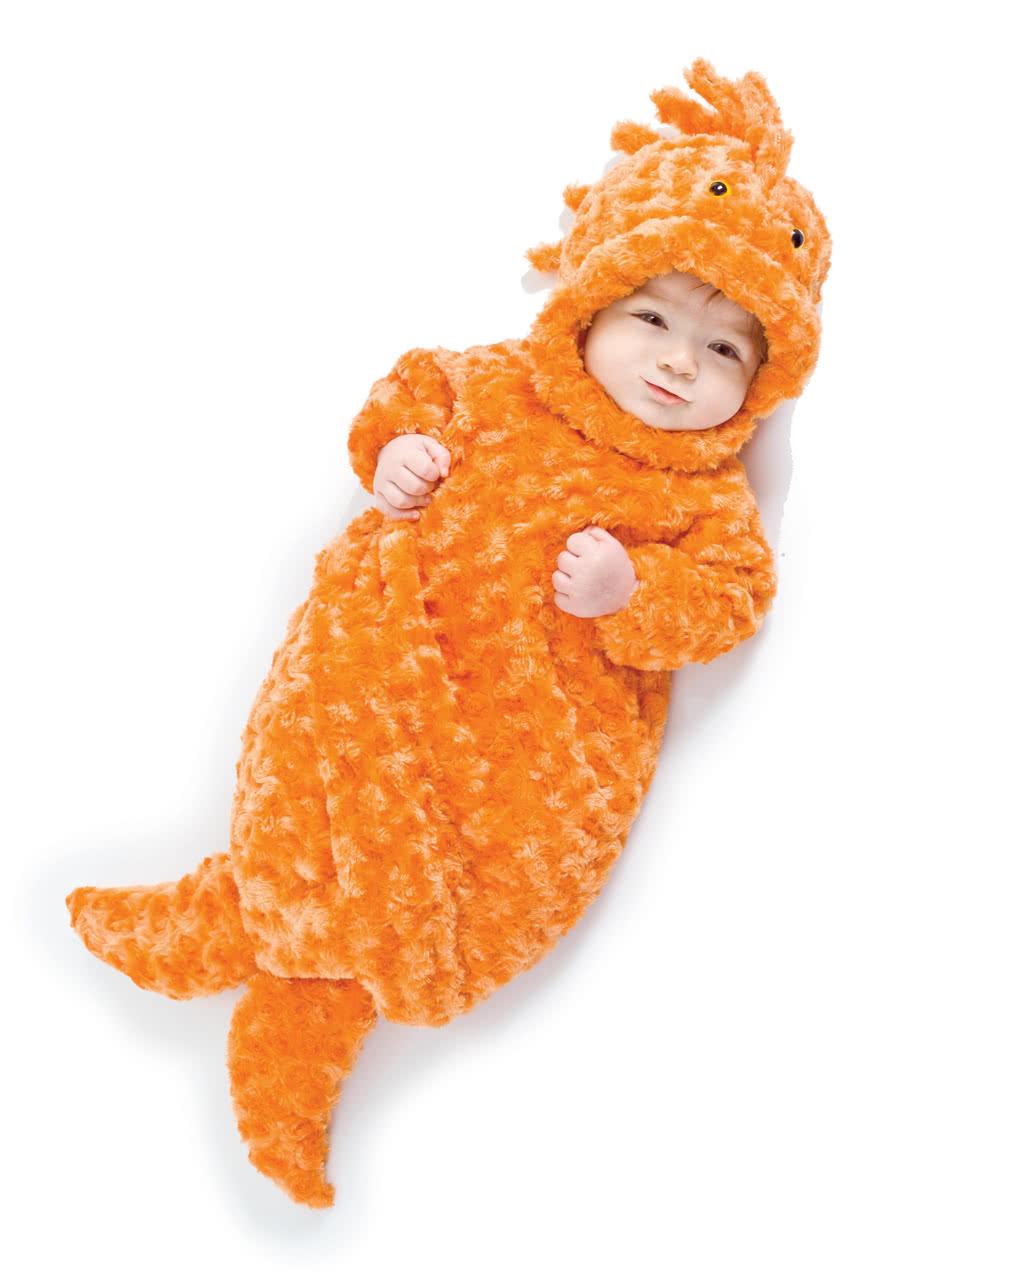 goldfisch kleinkinder kost m tierkost m f r babys karneval universe. Black Bedroom Furniture Sets. Home Design Ideas